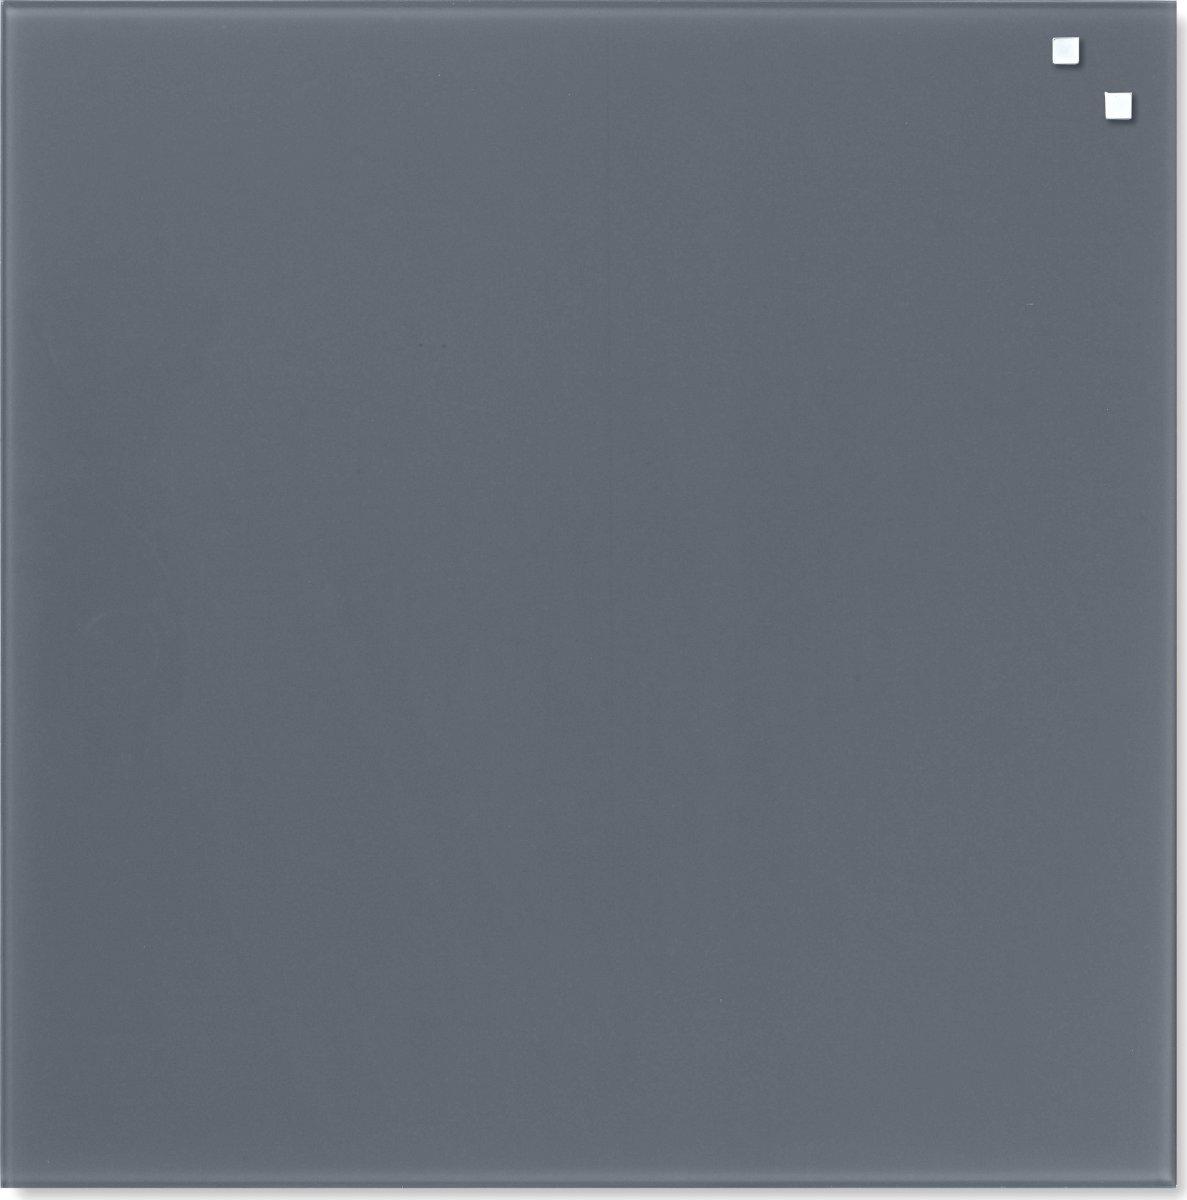 Glassboard magnetisk glastavle 45 x 45 cm, grå